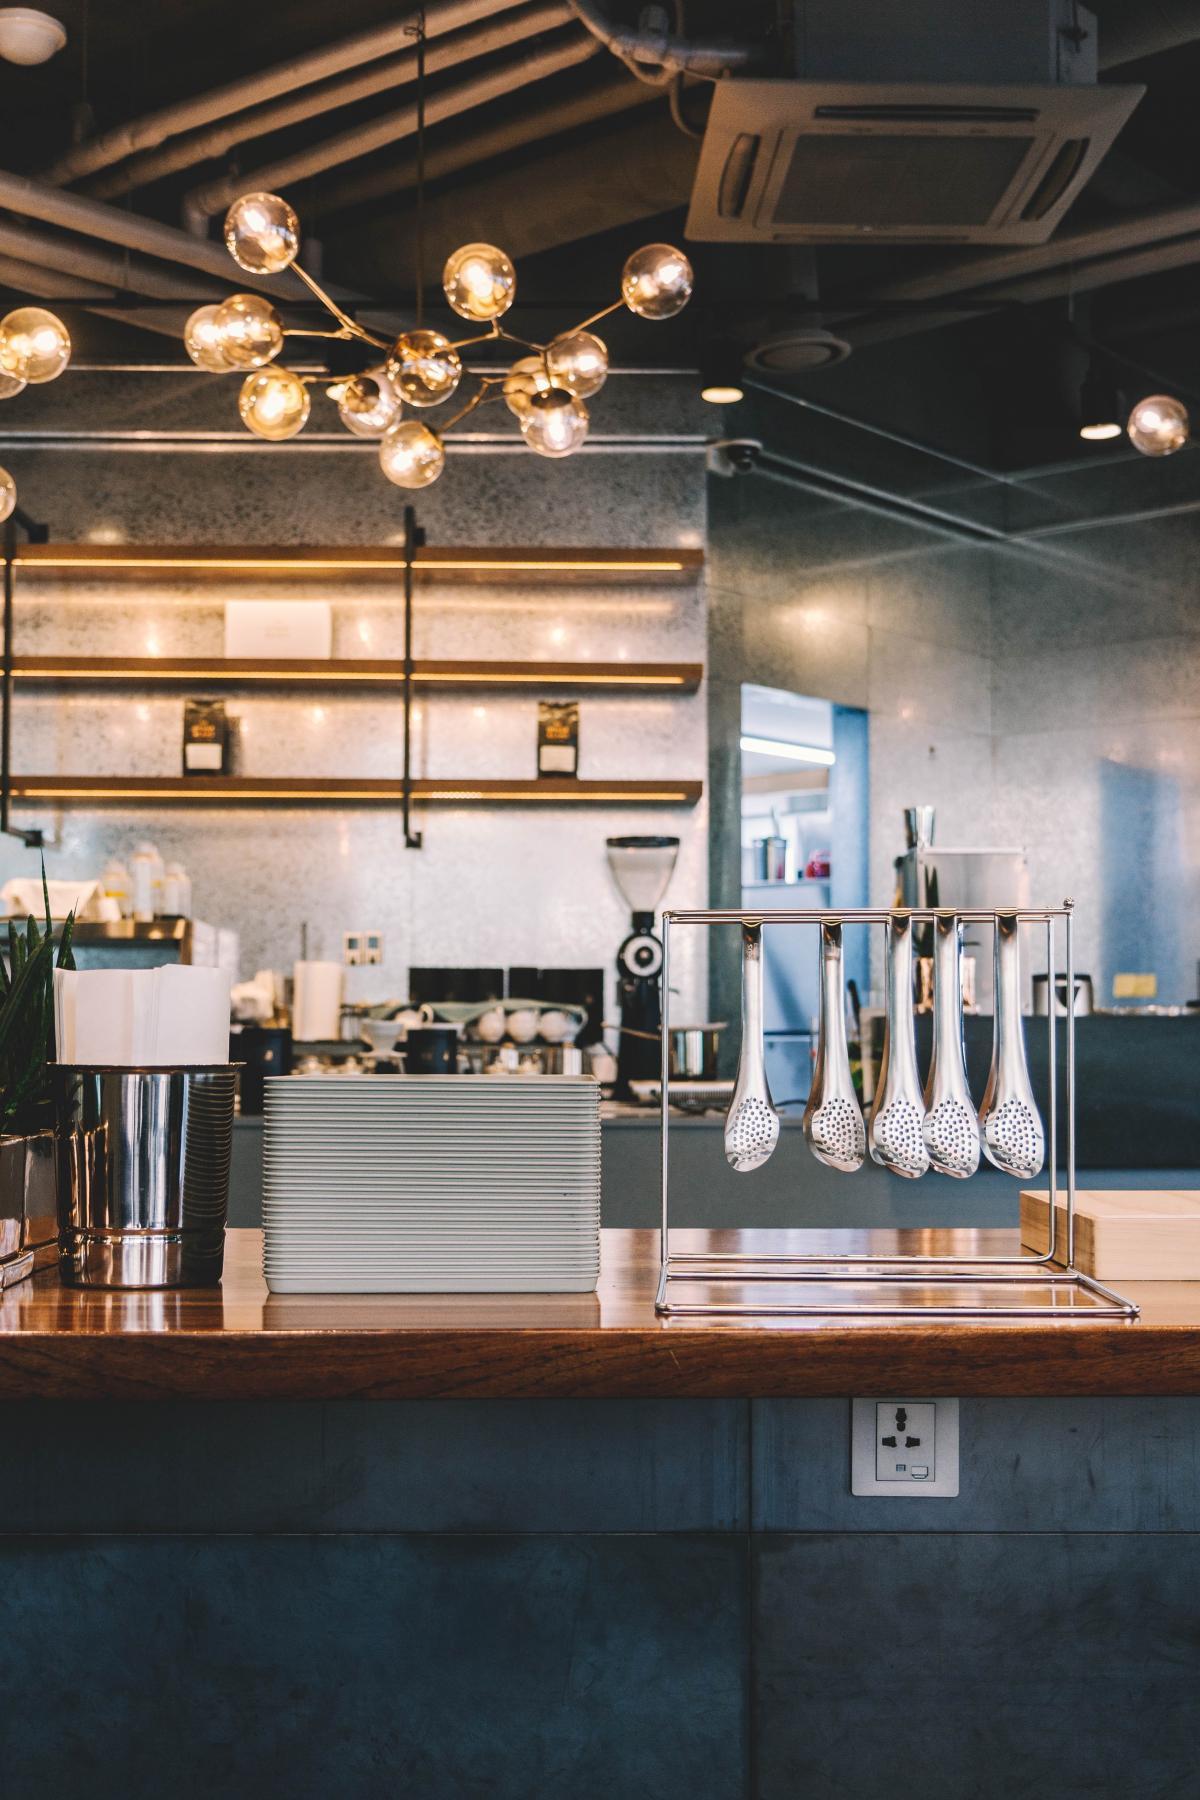 Case Interior Restaurant #422459